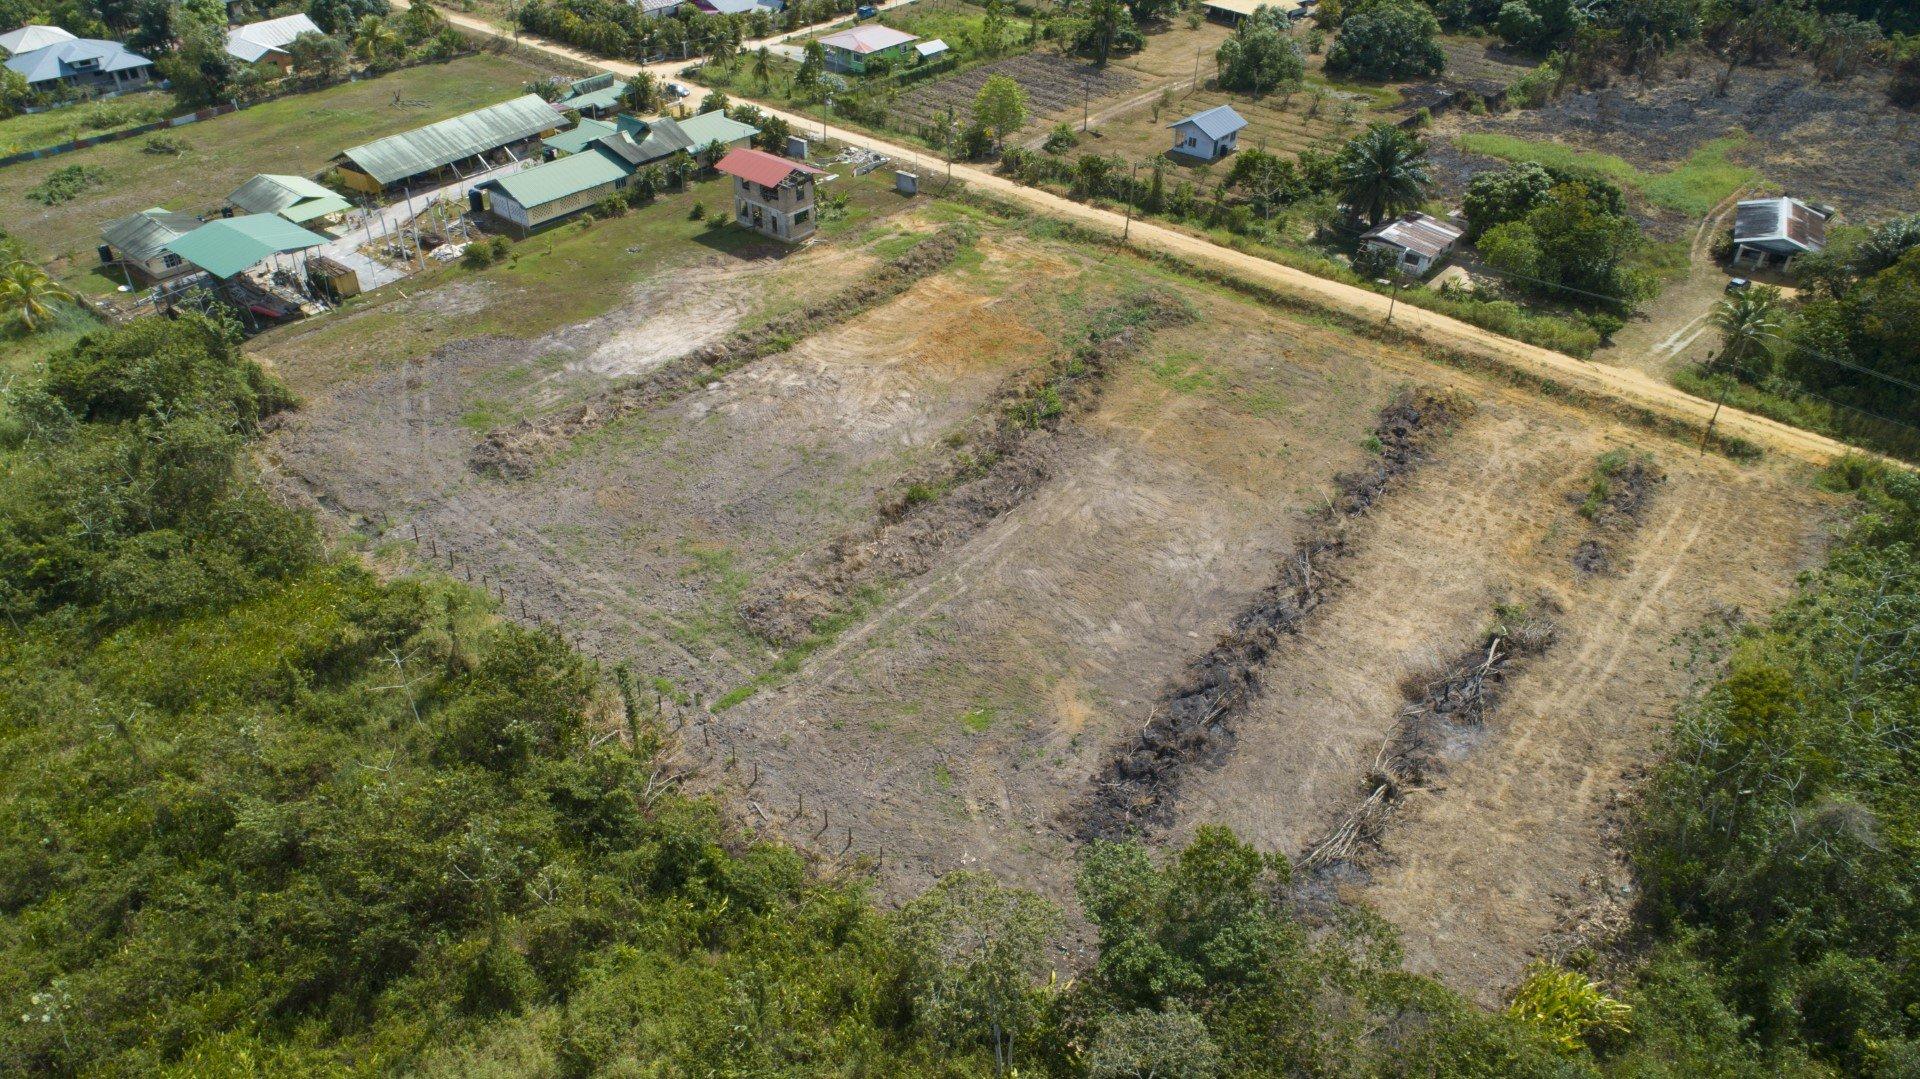 Talsmastraat 89 - Prachtige ruime kavel in een groene omgeving - Surgoed Makelaardij NV - Paramaribo, Suriname